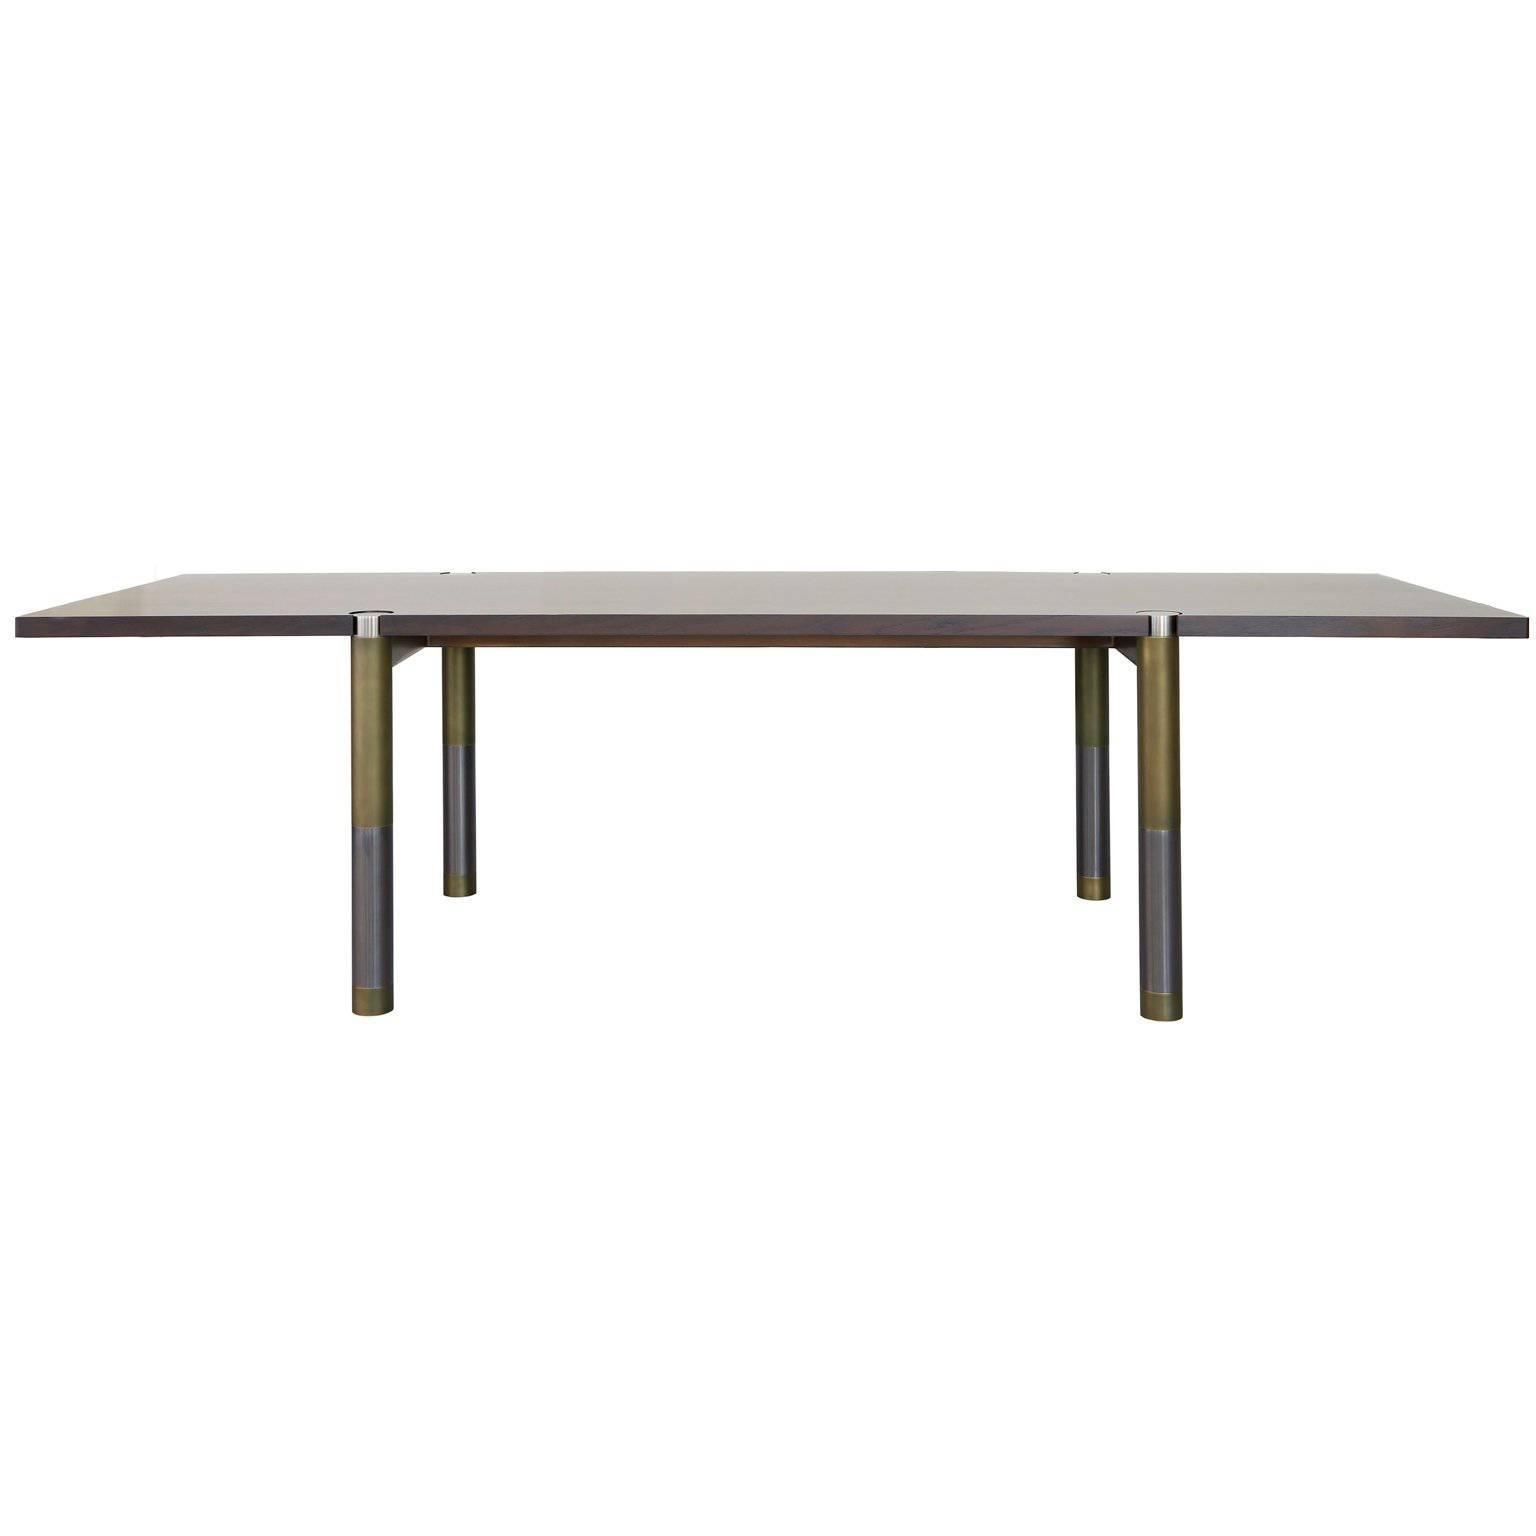 Nova Large Dining Table by AVRAM RUSU STUDIO